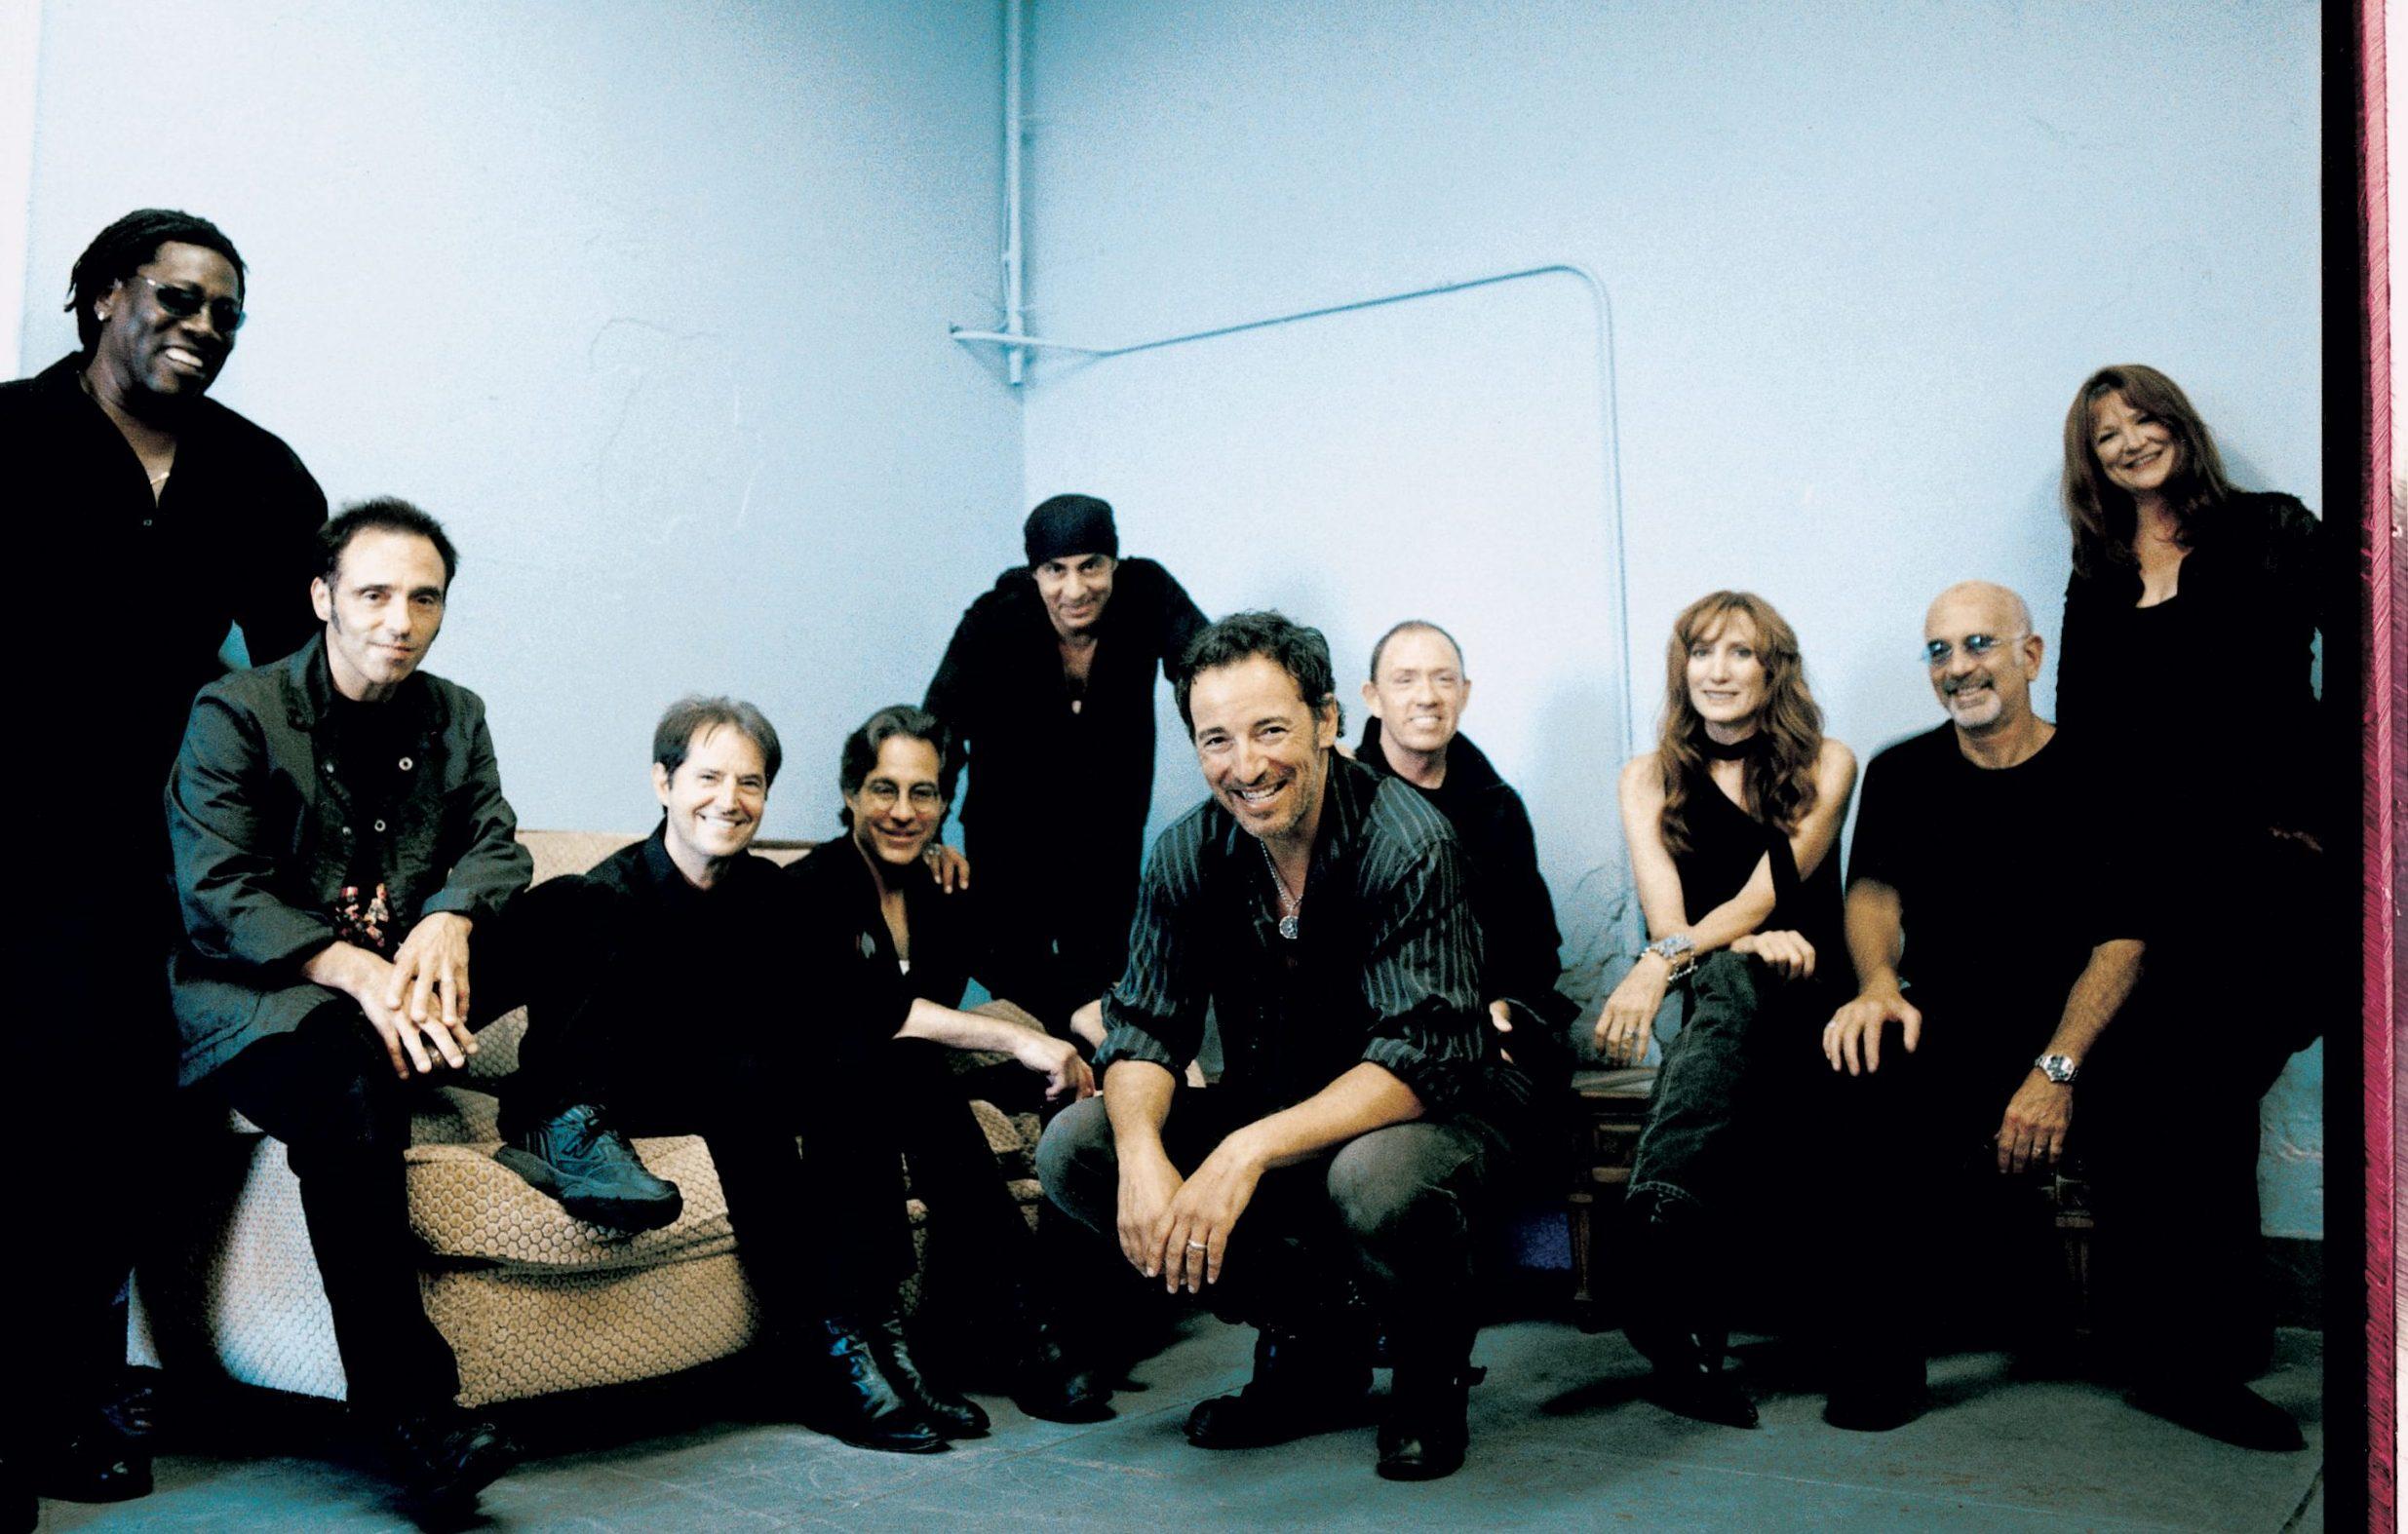 Plaat van de week: Bruce Springsteen & The E Street Band – My City Of Ruins